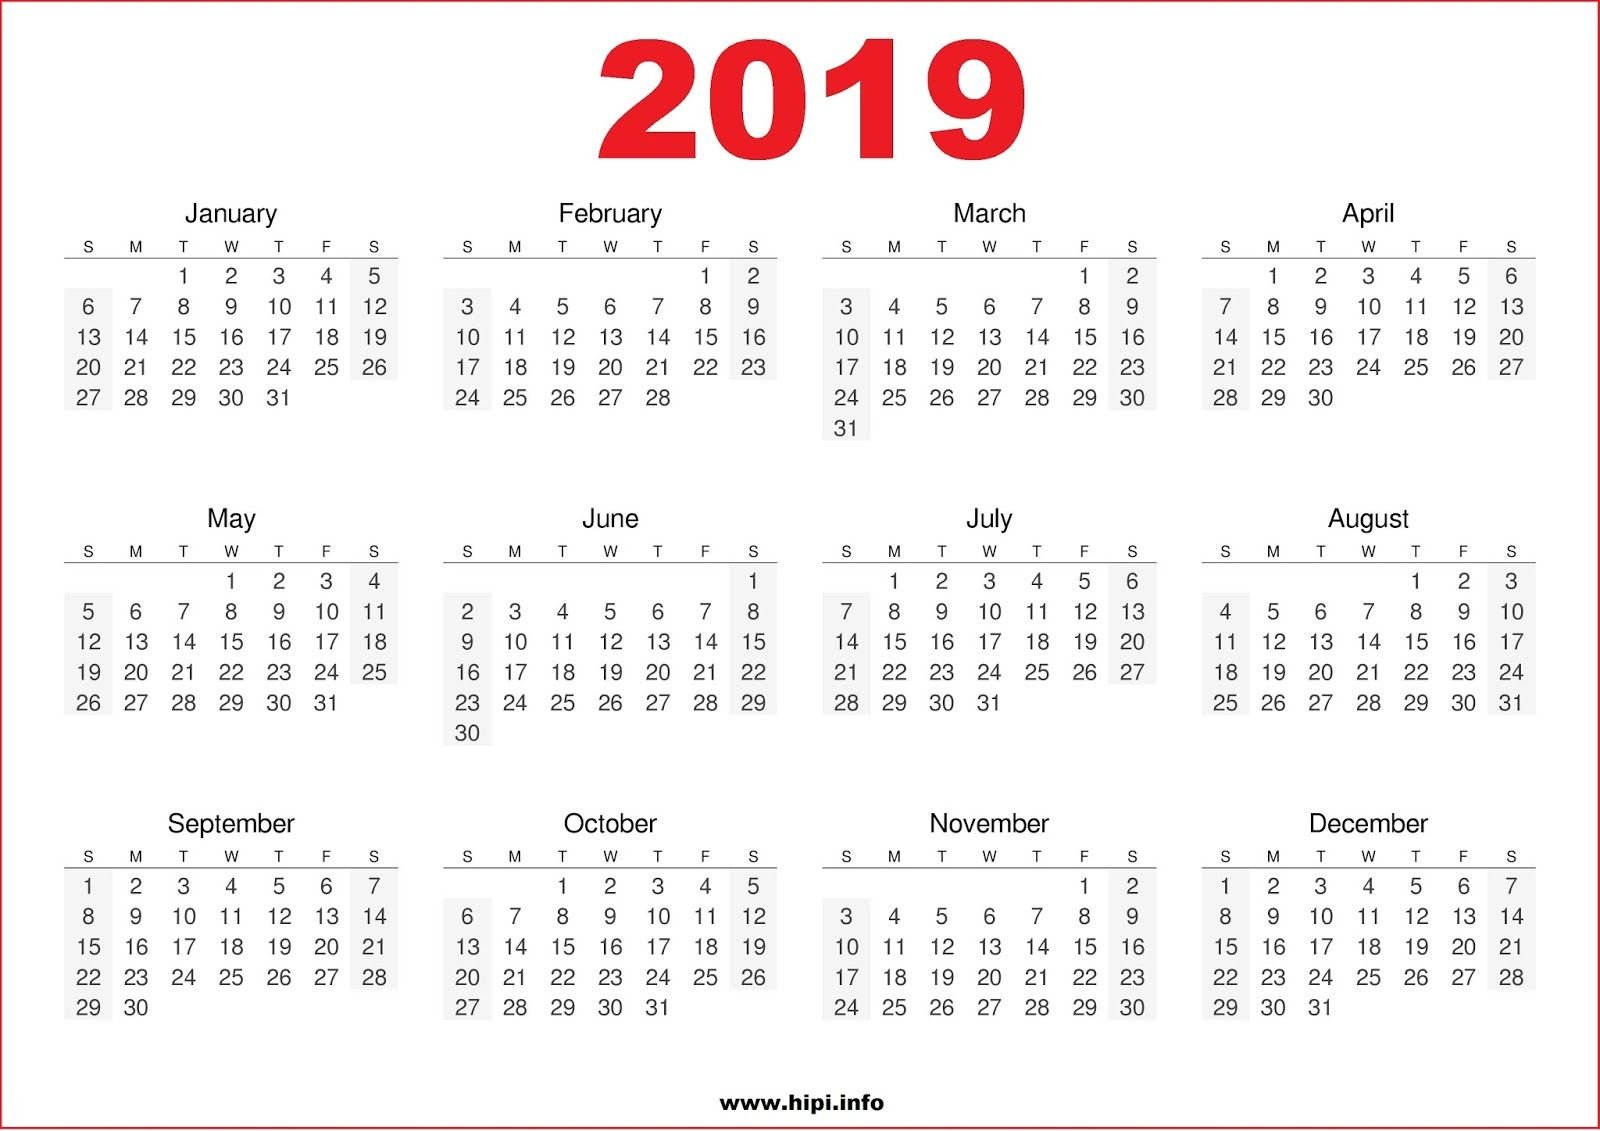 Calendar 2019 Wallpapers – Wallpaper Cave Calendar 2019 Wallpaper